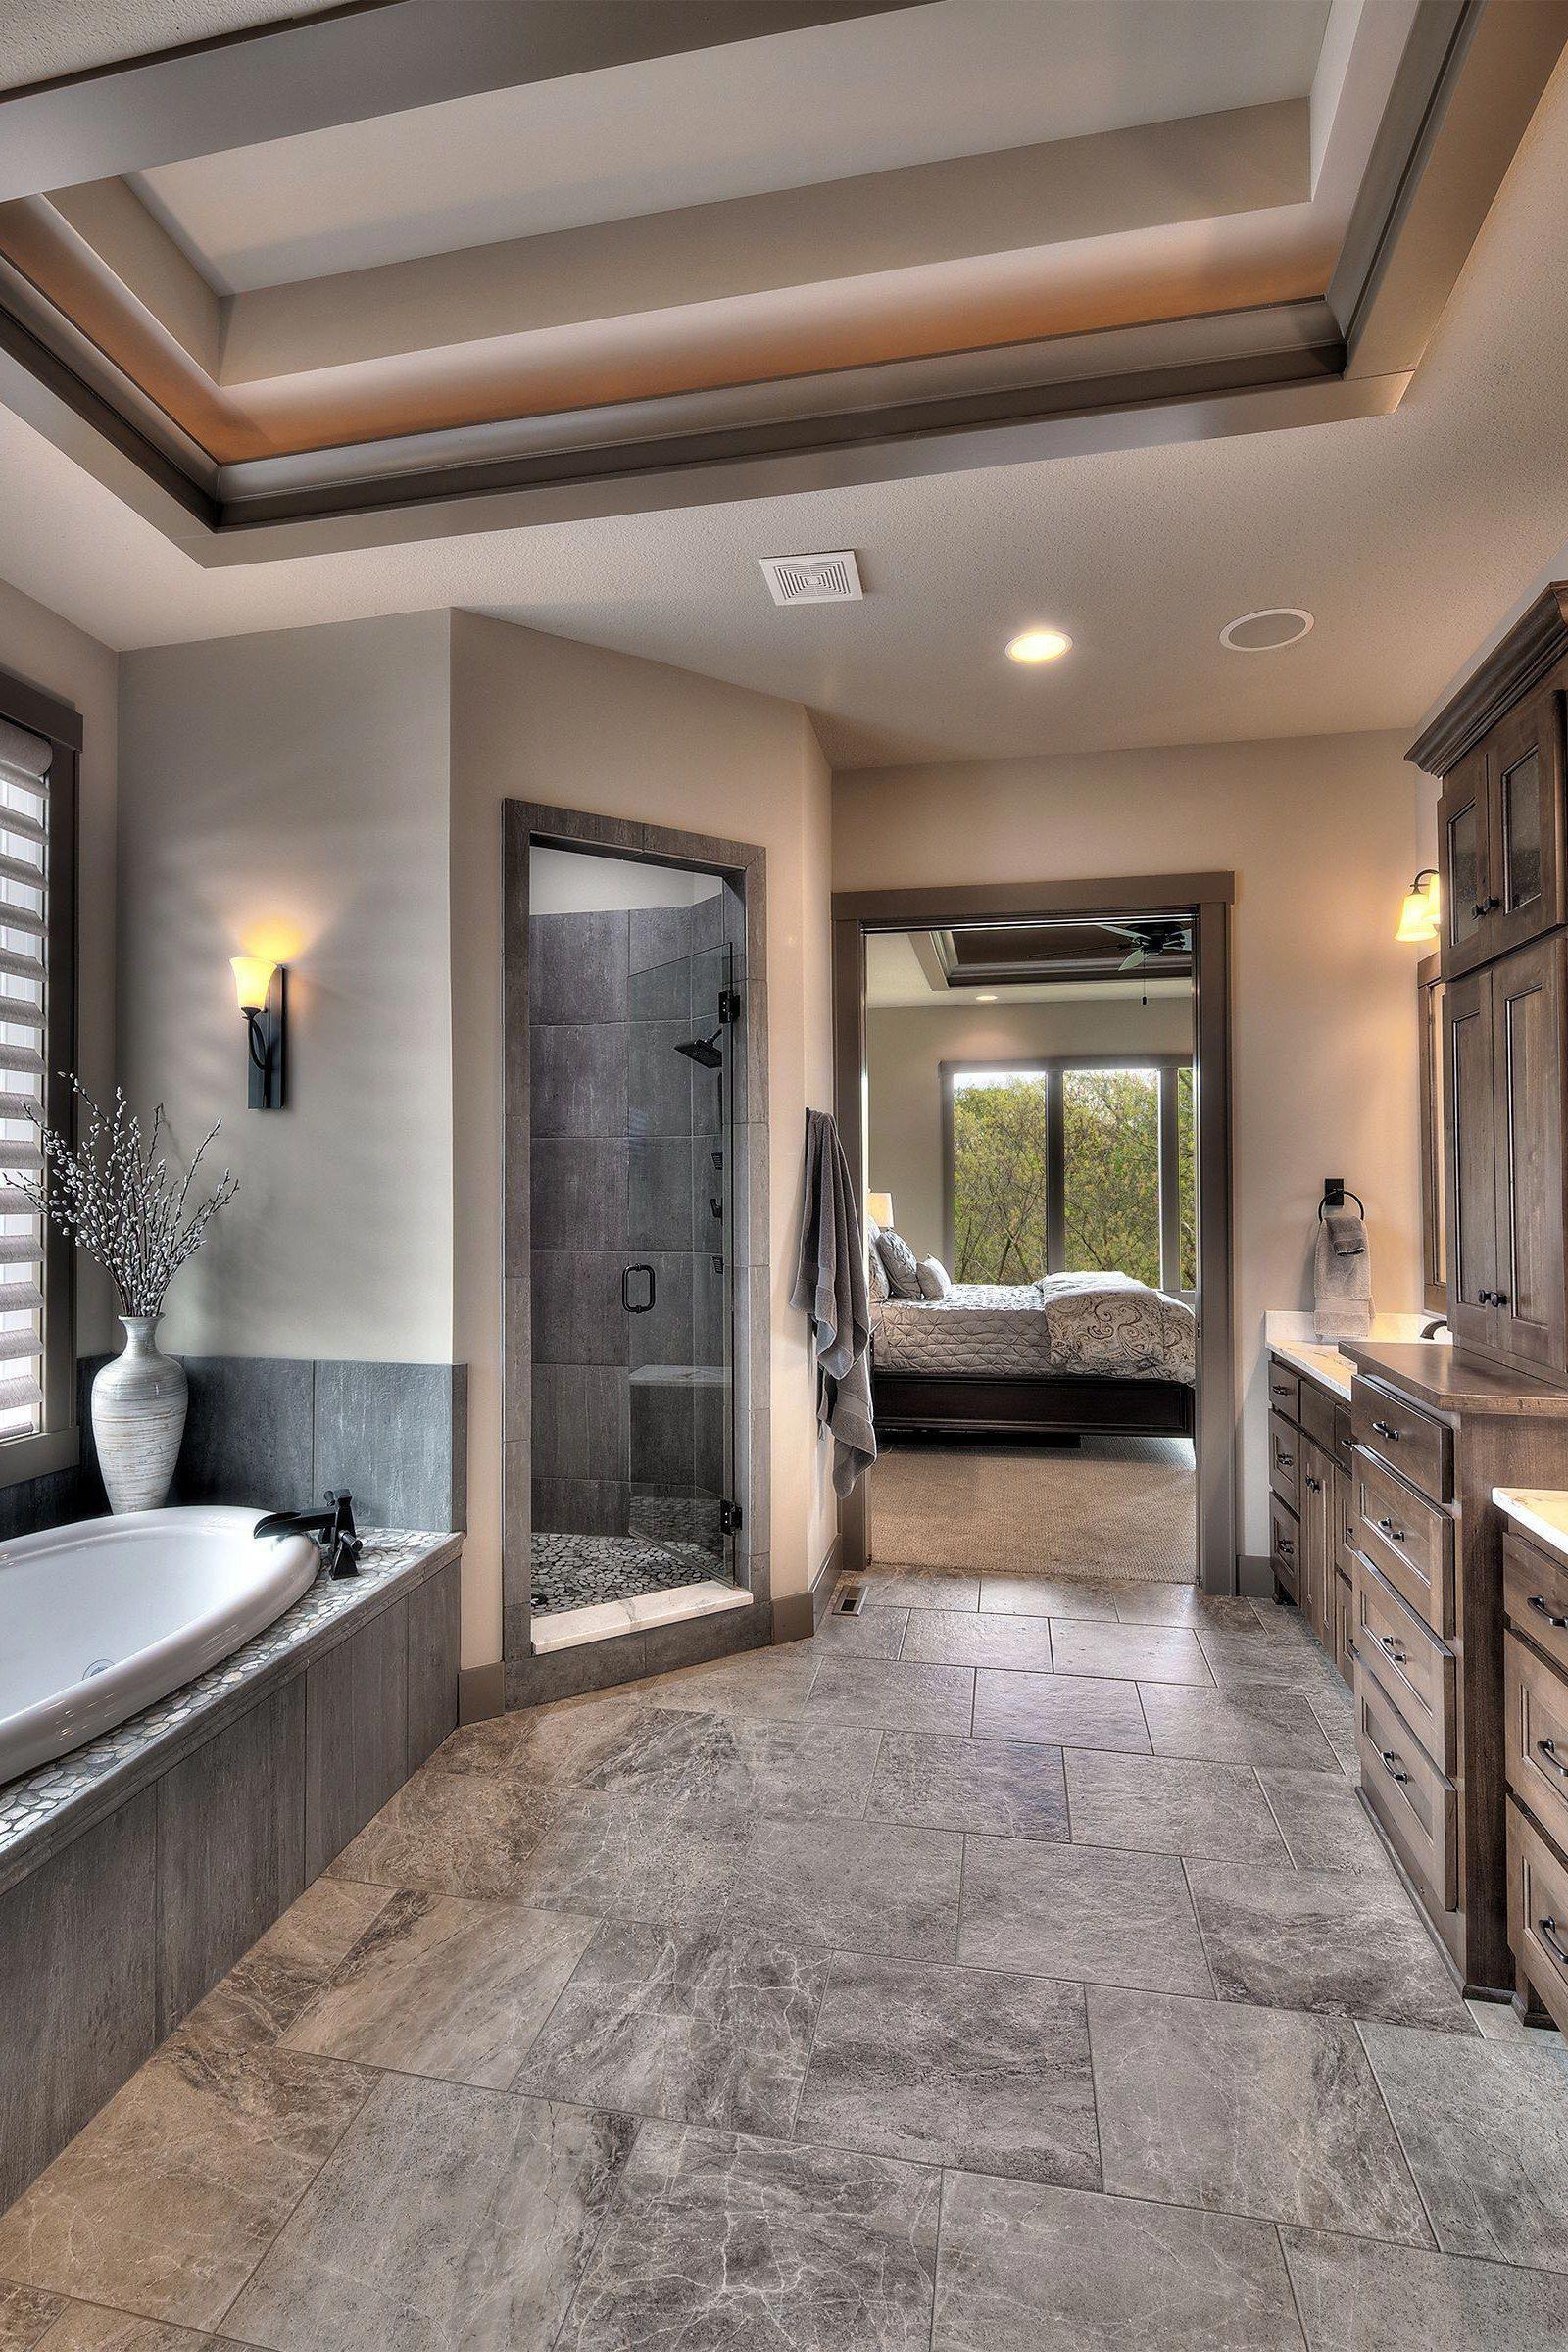 Bathroom Wall Decor Ideas Classy Bathroom Decor Light Purple